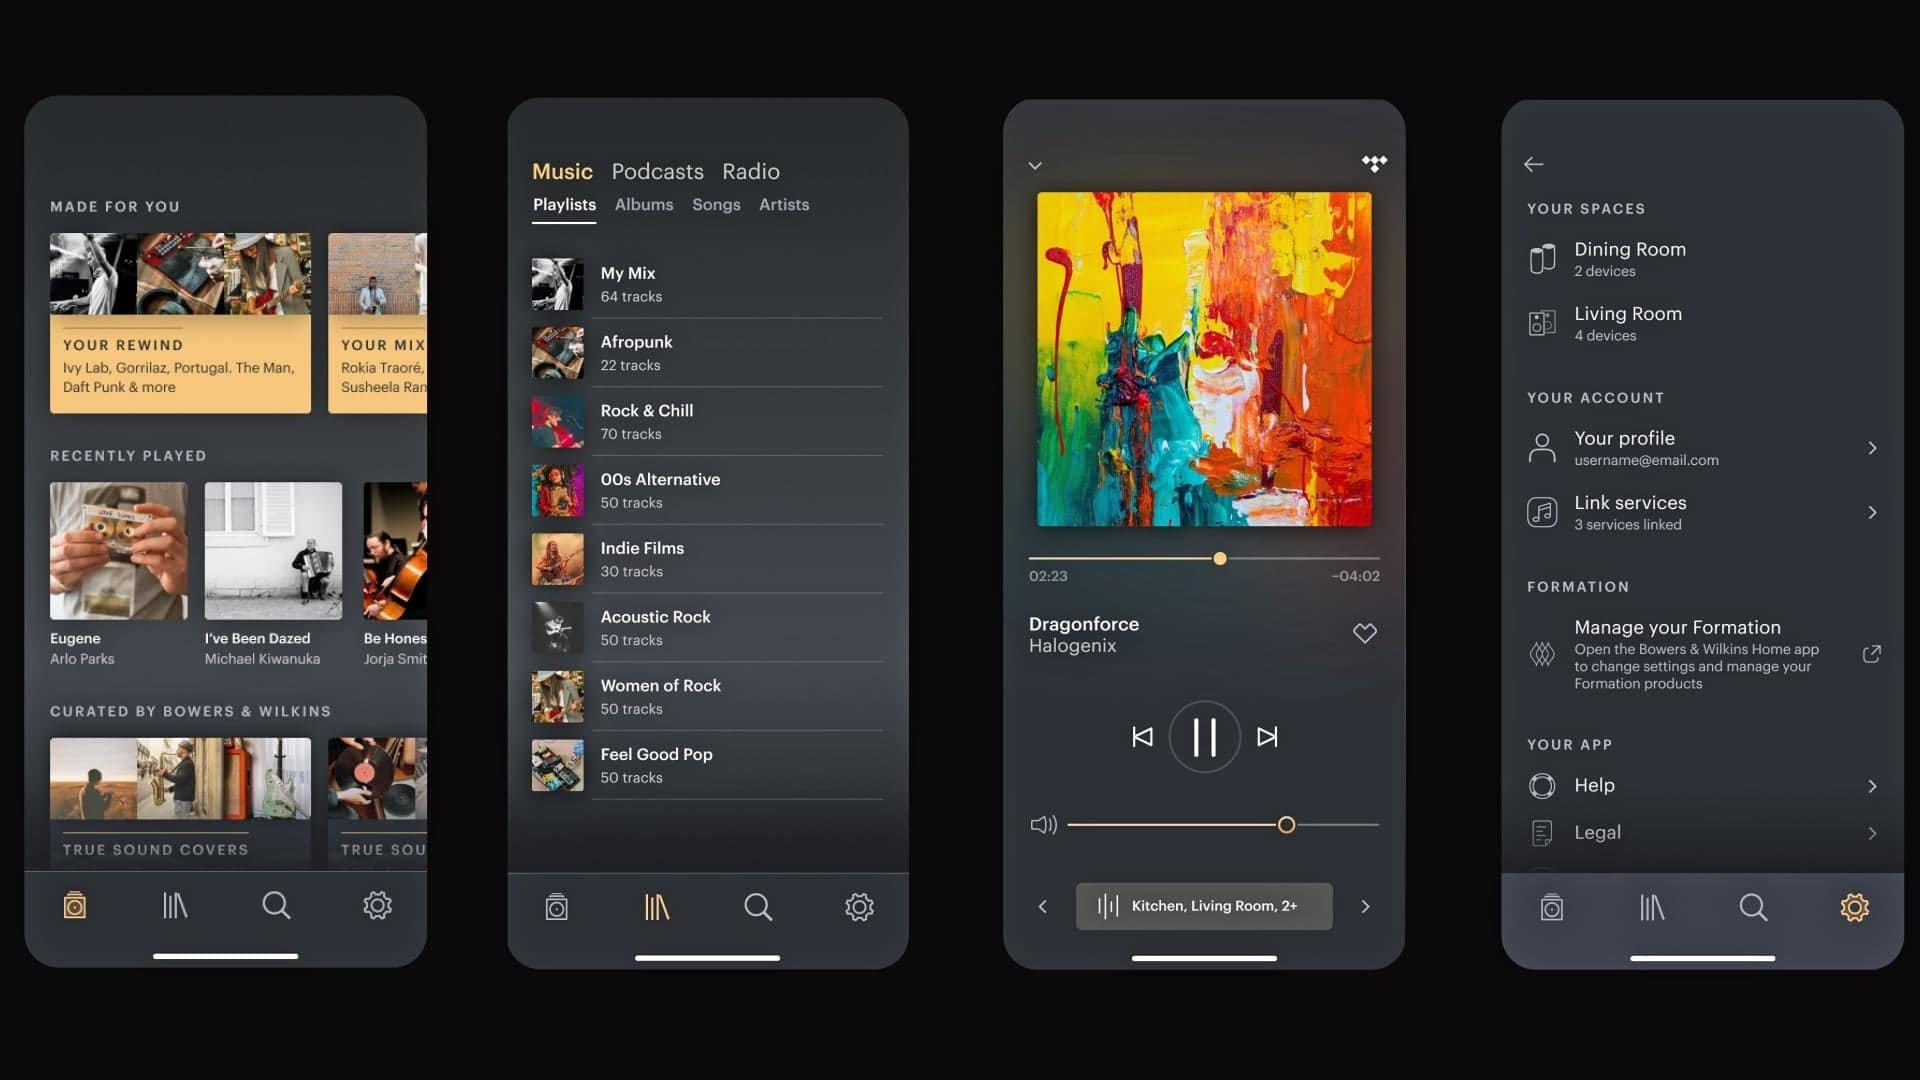 Bowers & Wilkins music app